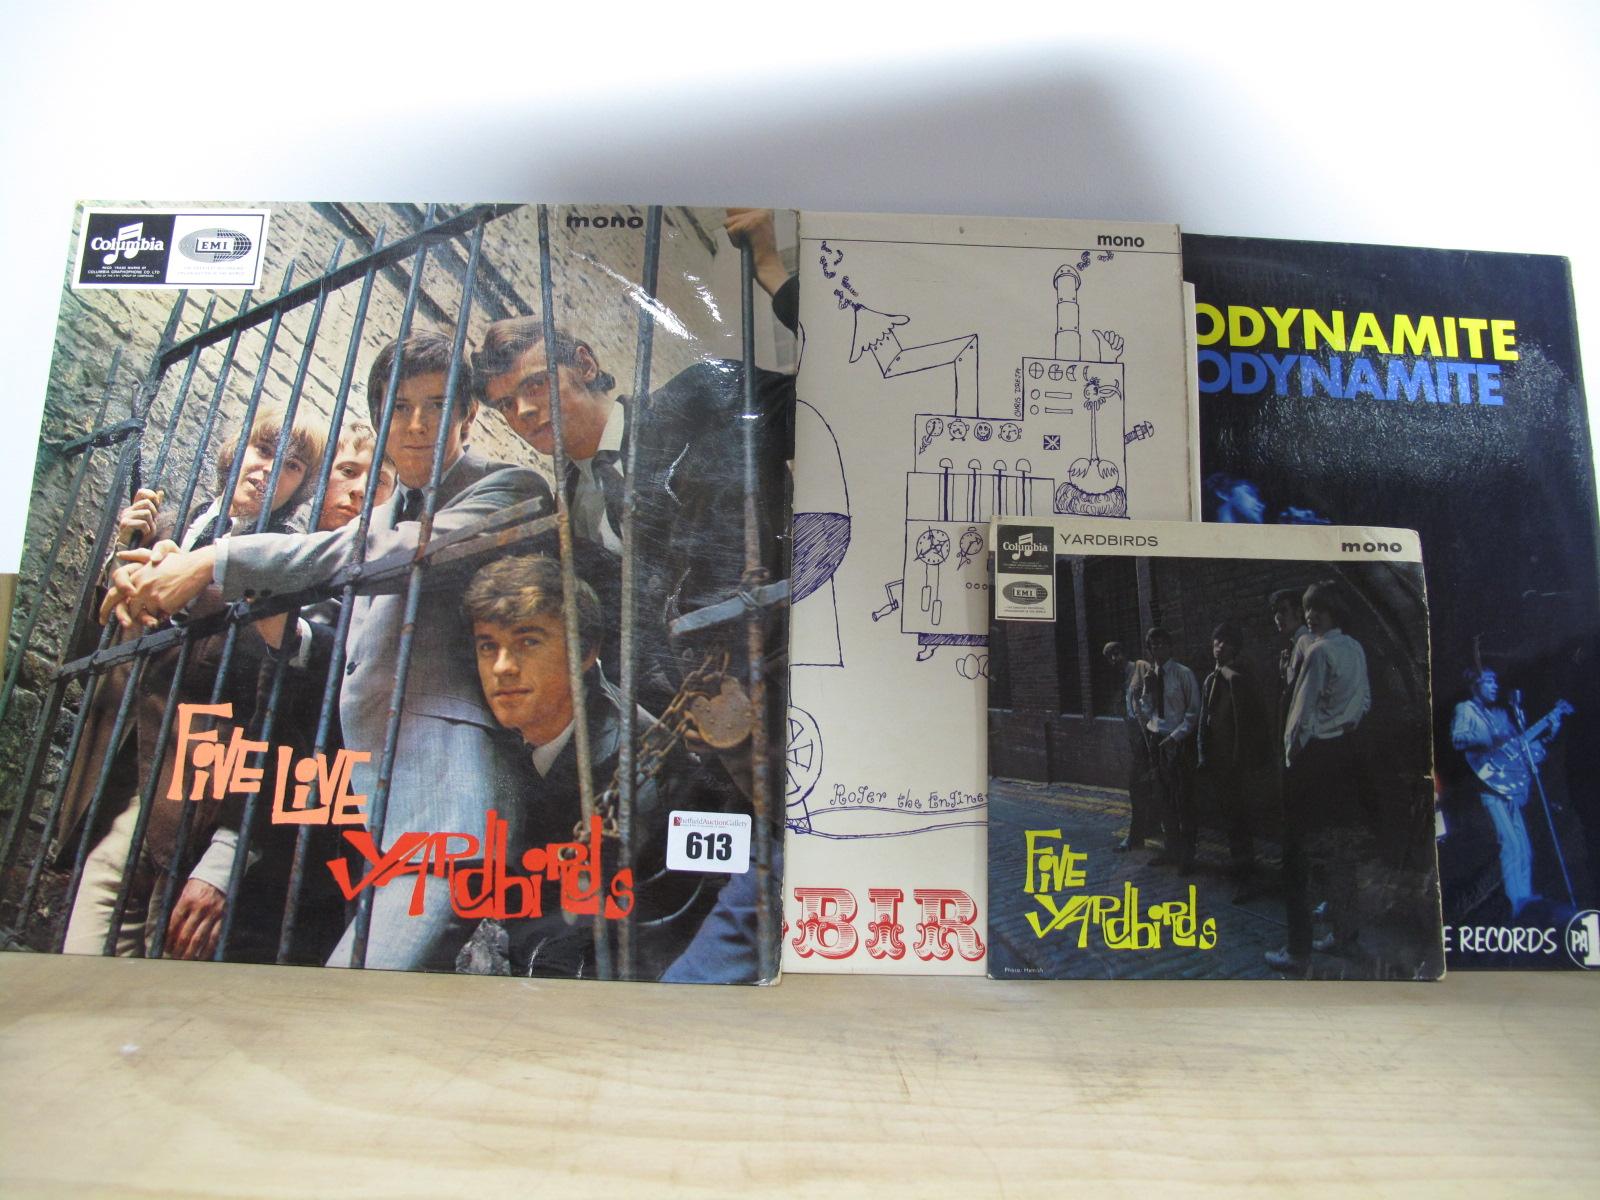 Lot 613 - Yardbirds 'Five Live' LP, 1964, Mono 33SX 1677, Columbia blue/black, 1N/1N matrix, Emitex inner,